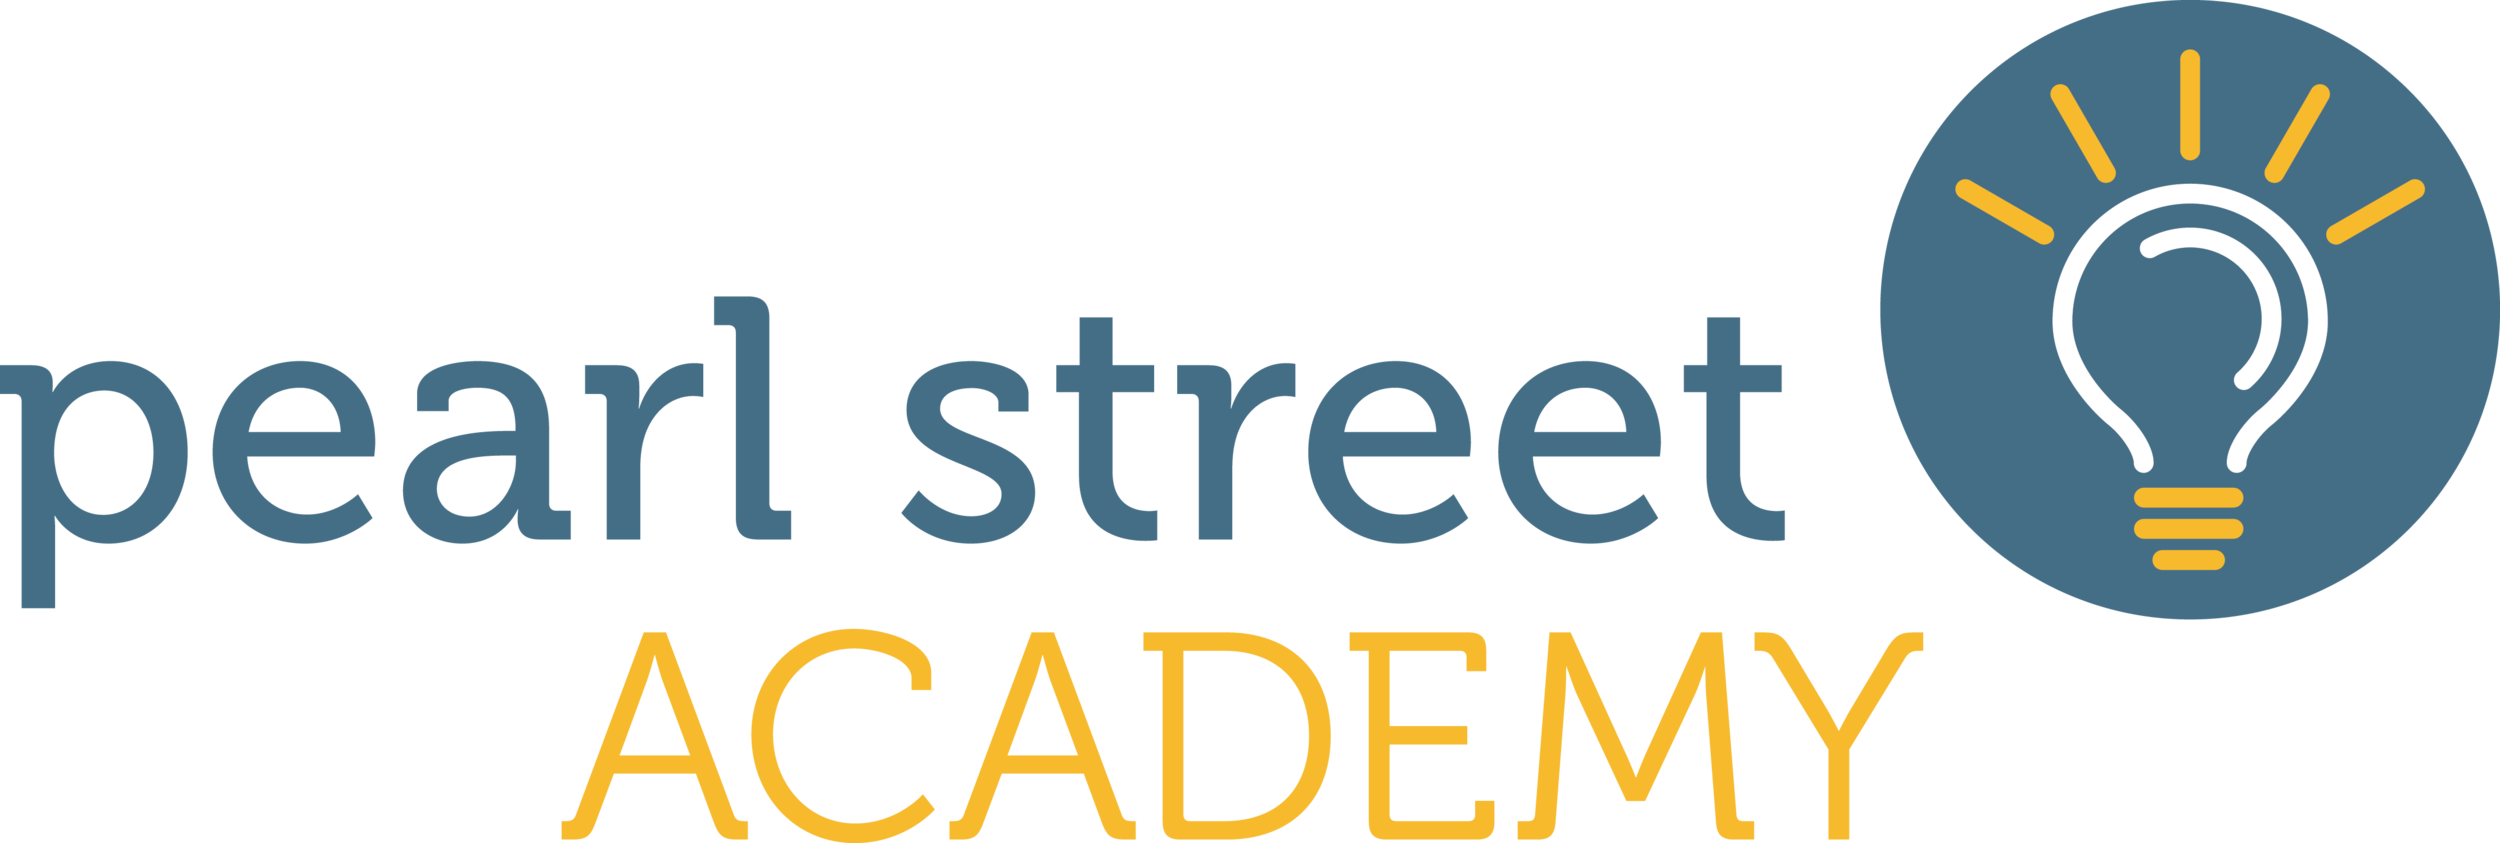 PearlStreetAcademy_Logo_RGB.png